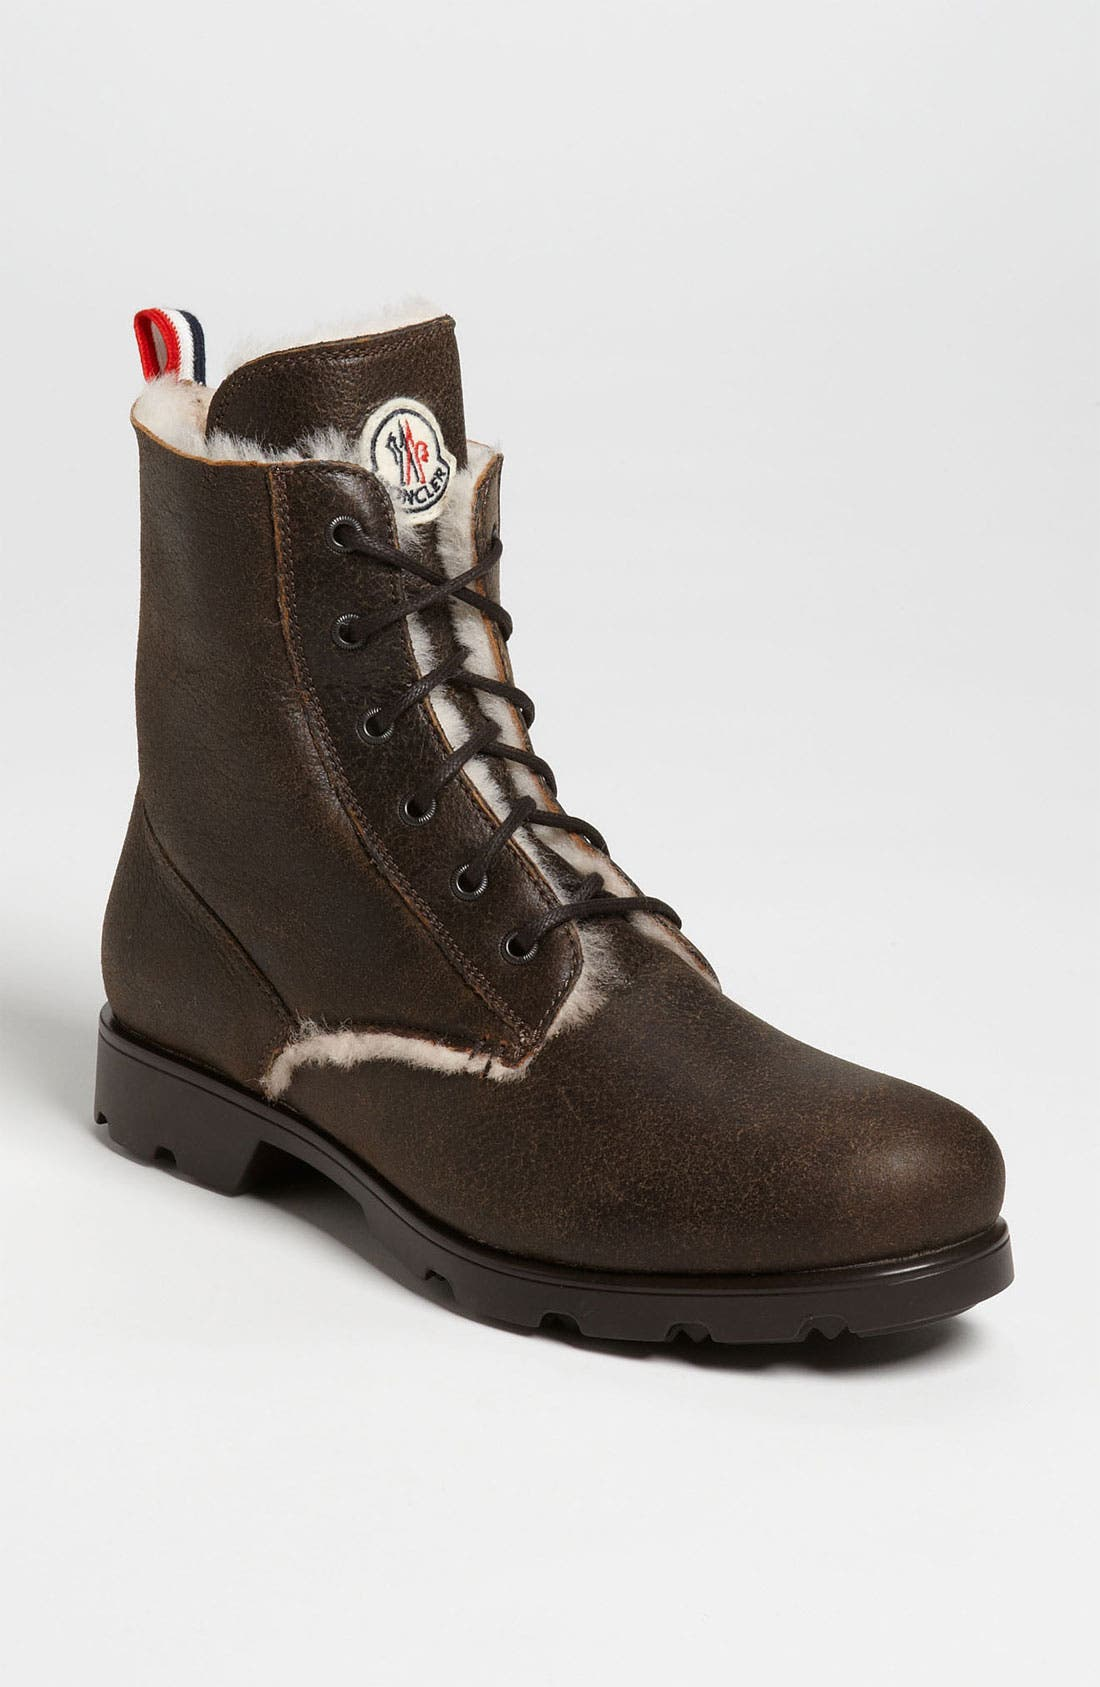 Main Image - Moncler 'Vancouver' Shearling Boot